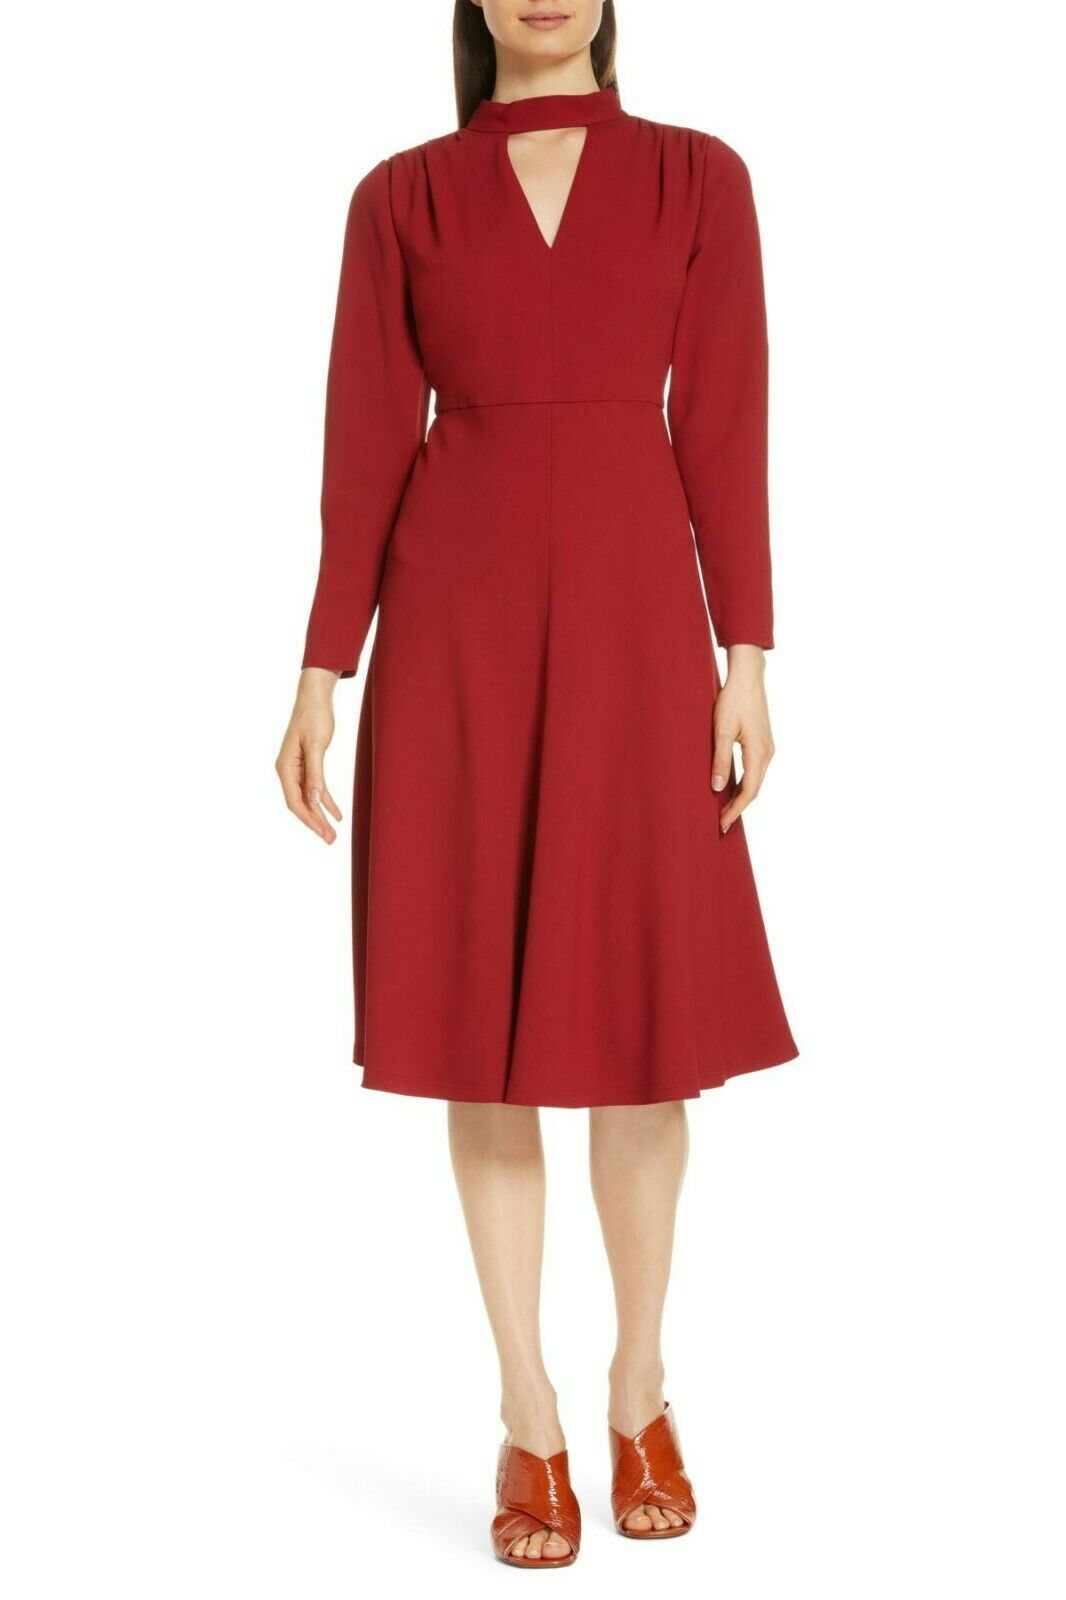 Lewit rot Dahlia Fit & Flare Dress Größe 6 Originally